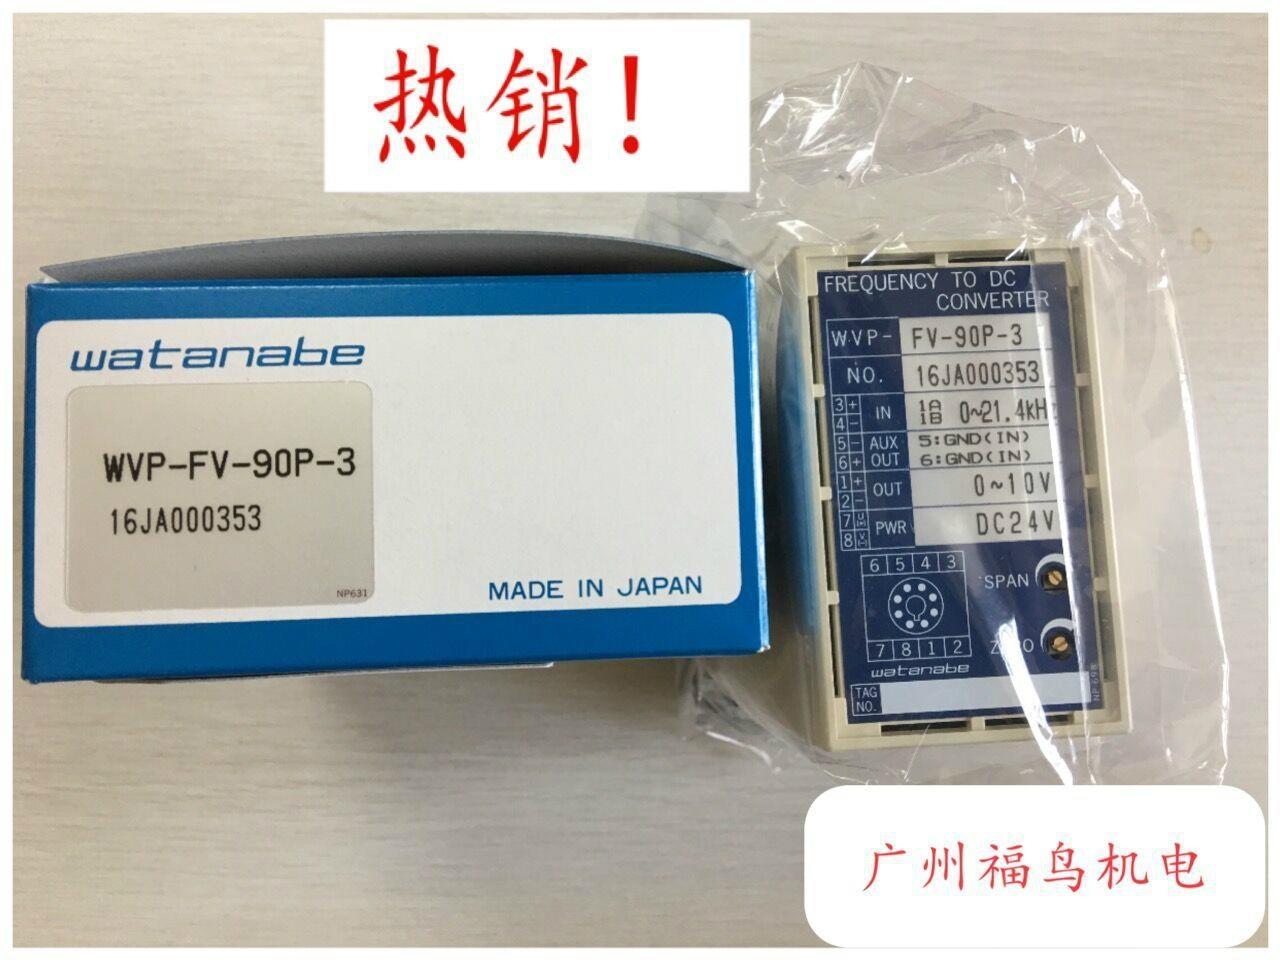 WATANABE信号转换器, 型号: WVP-FV-90P-3